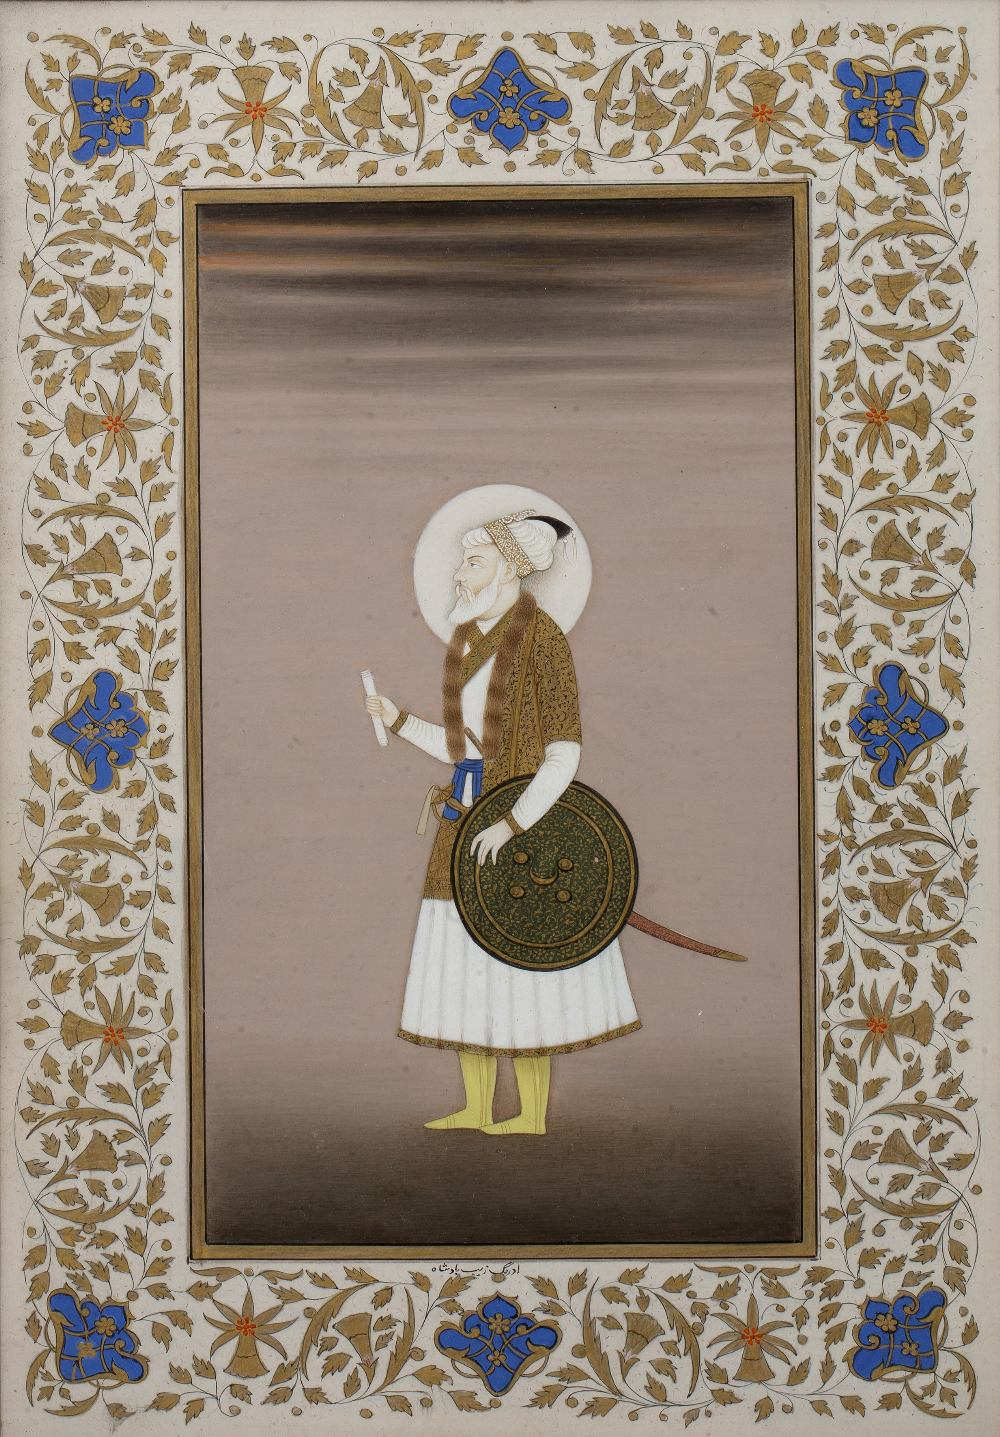 Ustad Haji Muhammad Sharif (1889-1978) 'Aurangzeb, Mughal Emperor of India' painting on paper,